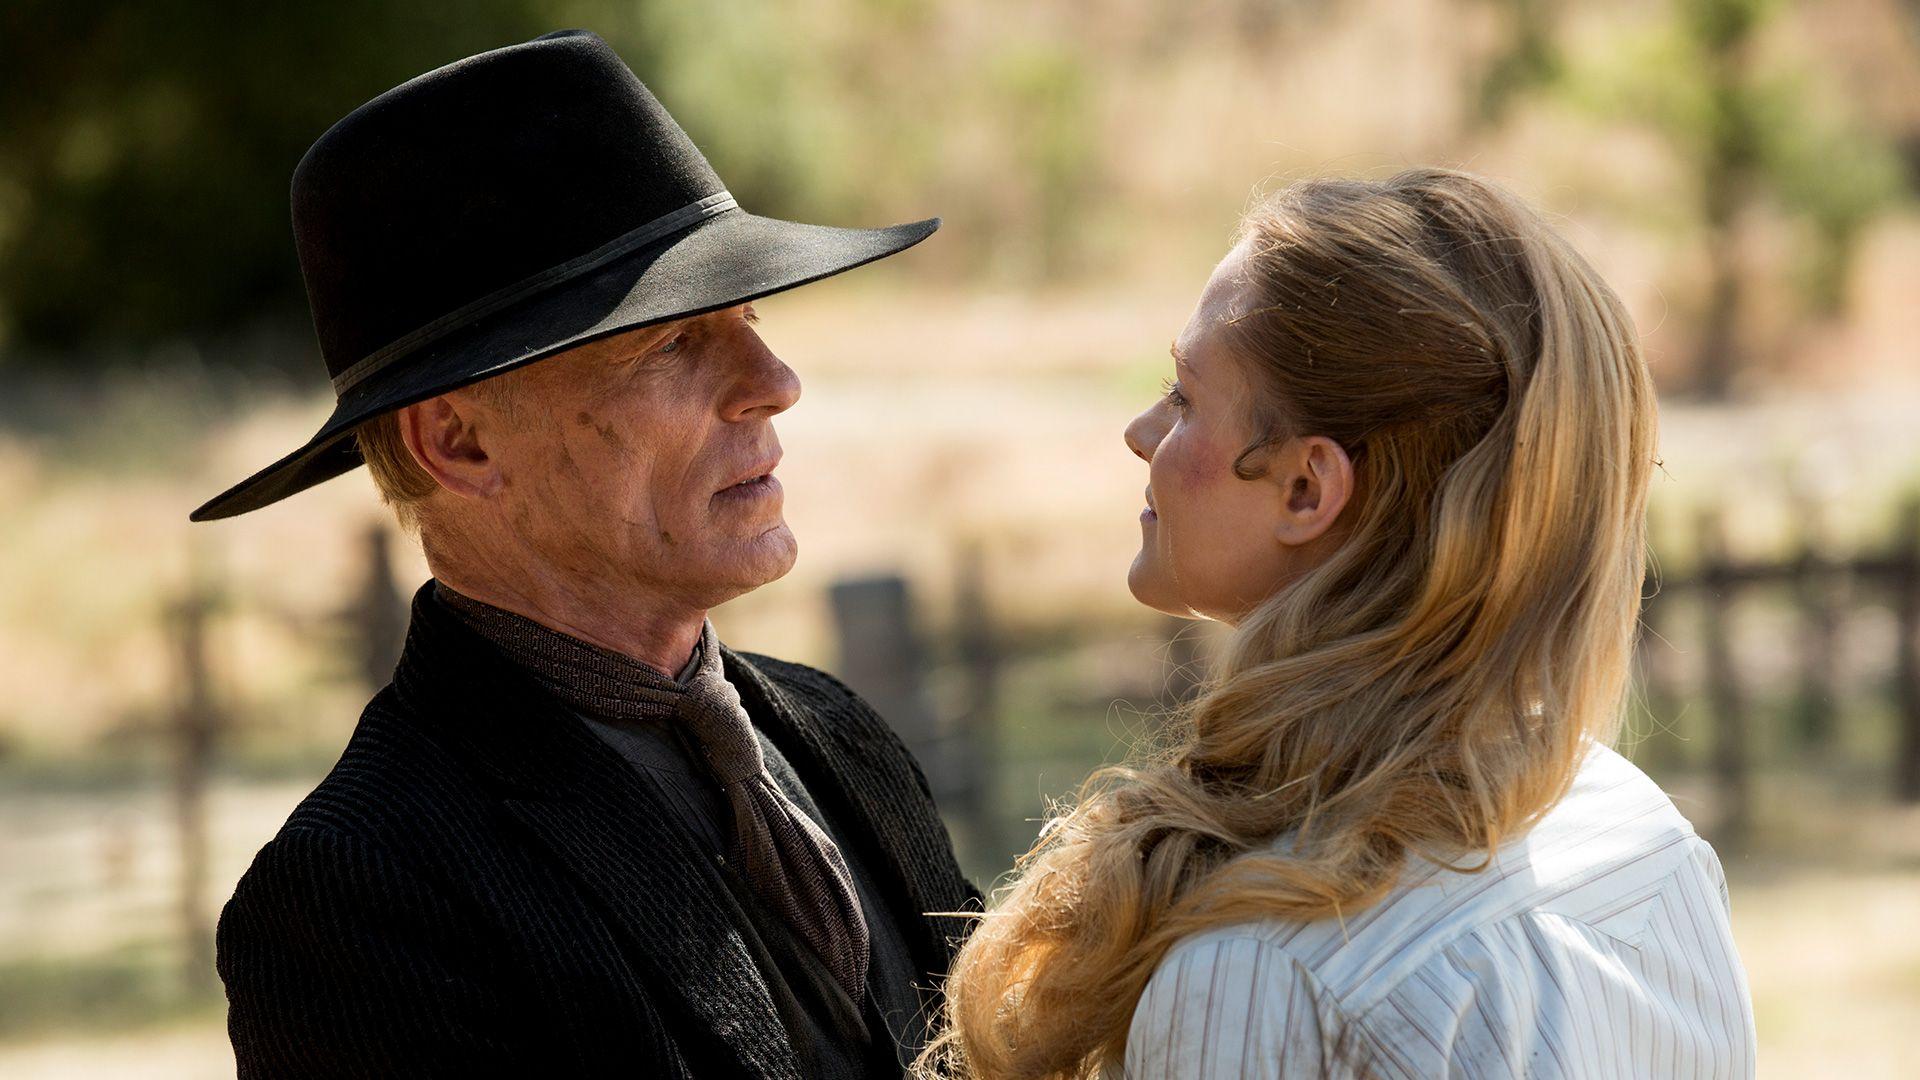 Ed Harris as The Man in Black in Westworld